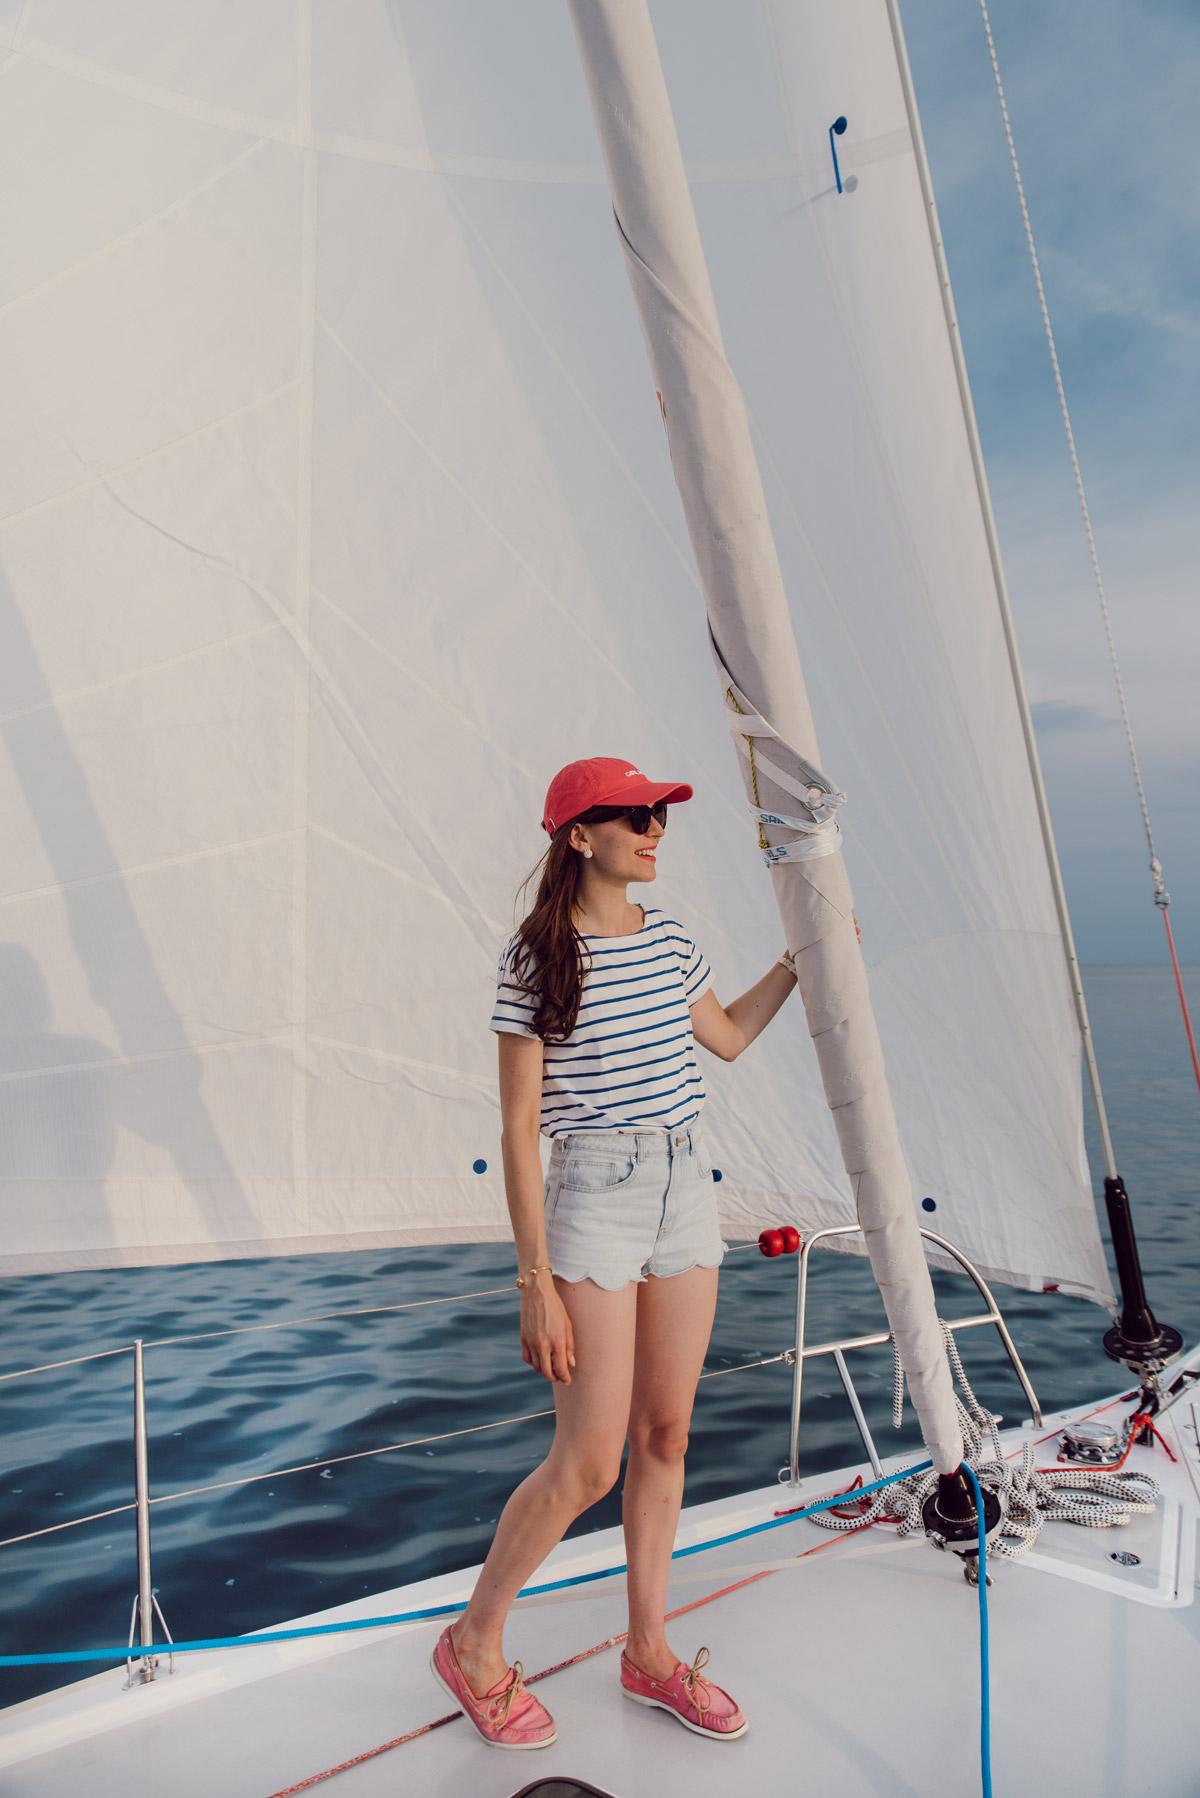 Maif-navigation-Accompagnee-La-Rochelle-bateau-6